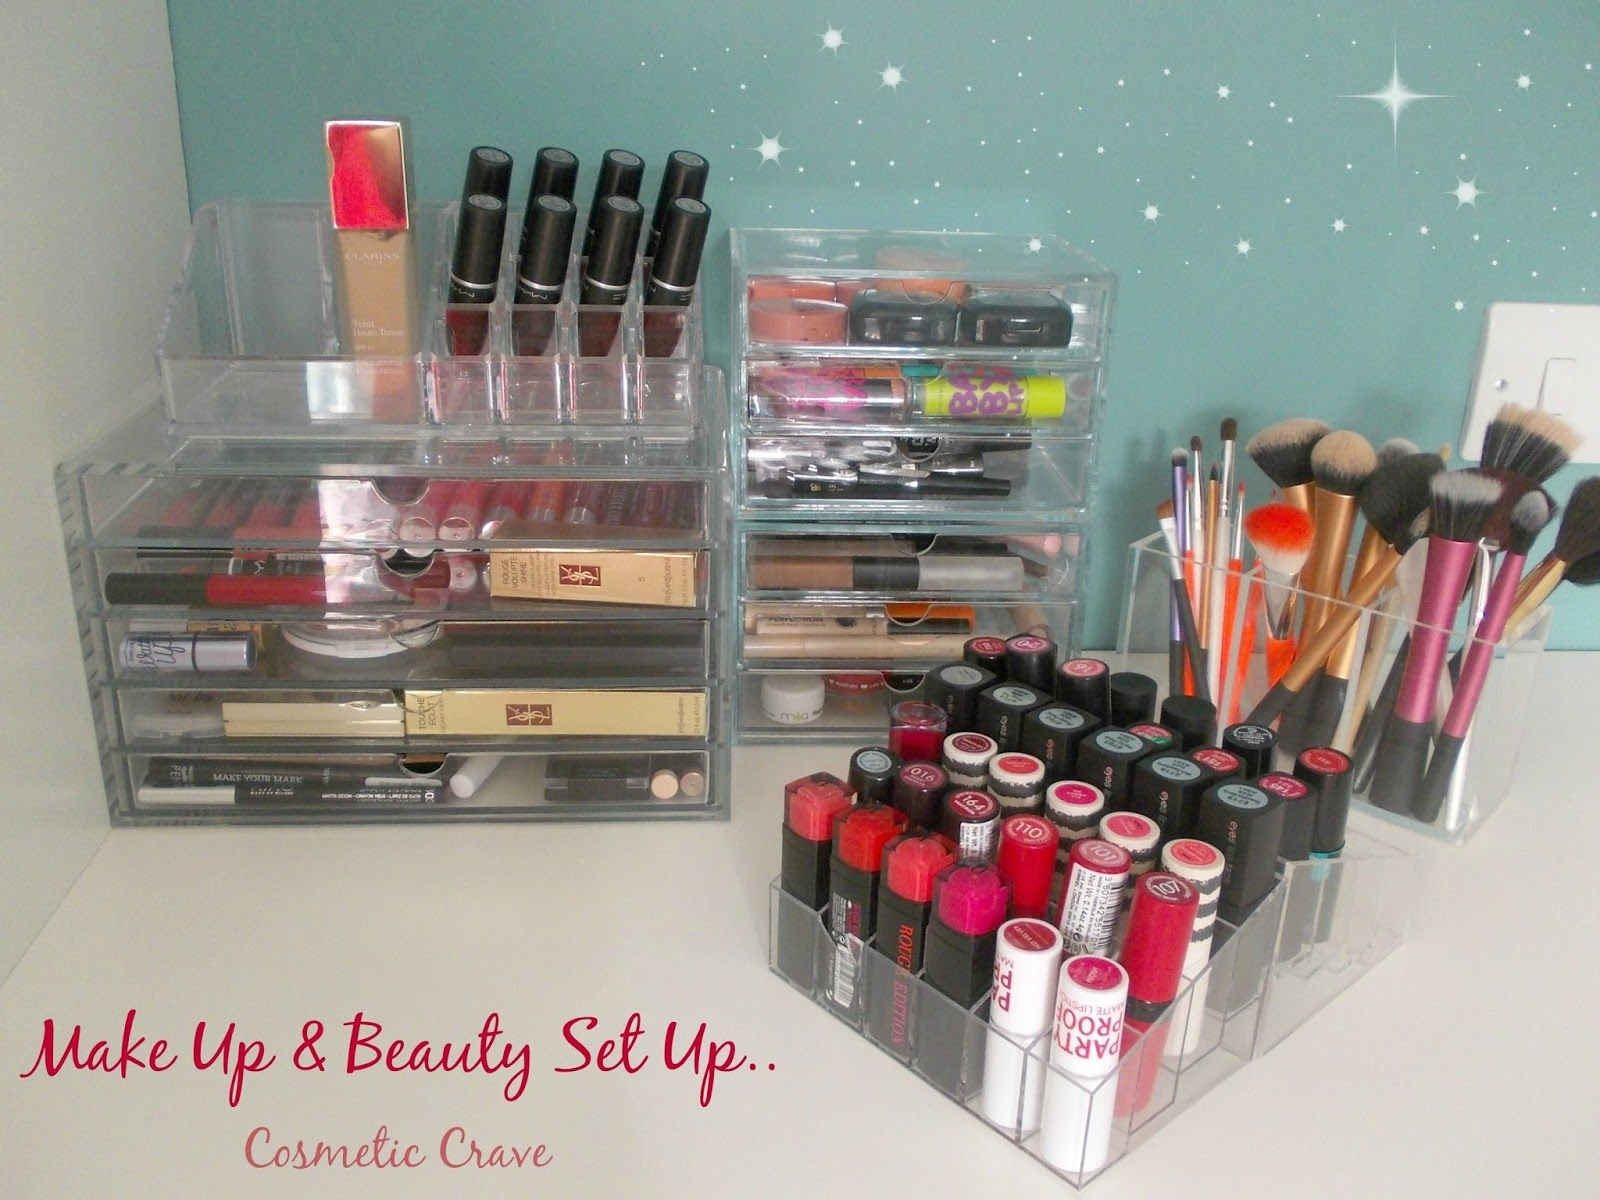 Muji Makeup Organizer Beauteous Cosmetic Crave Muji And Ikea Storage  Make Up And Beauty Set Up Design Decoration